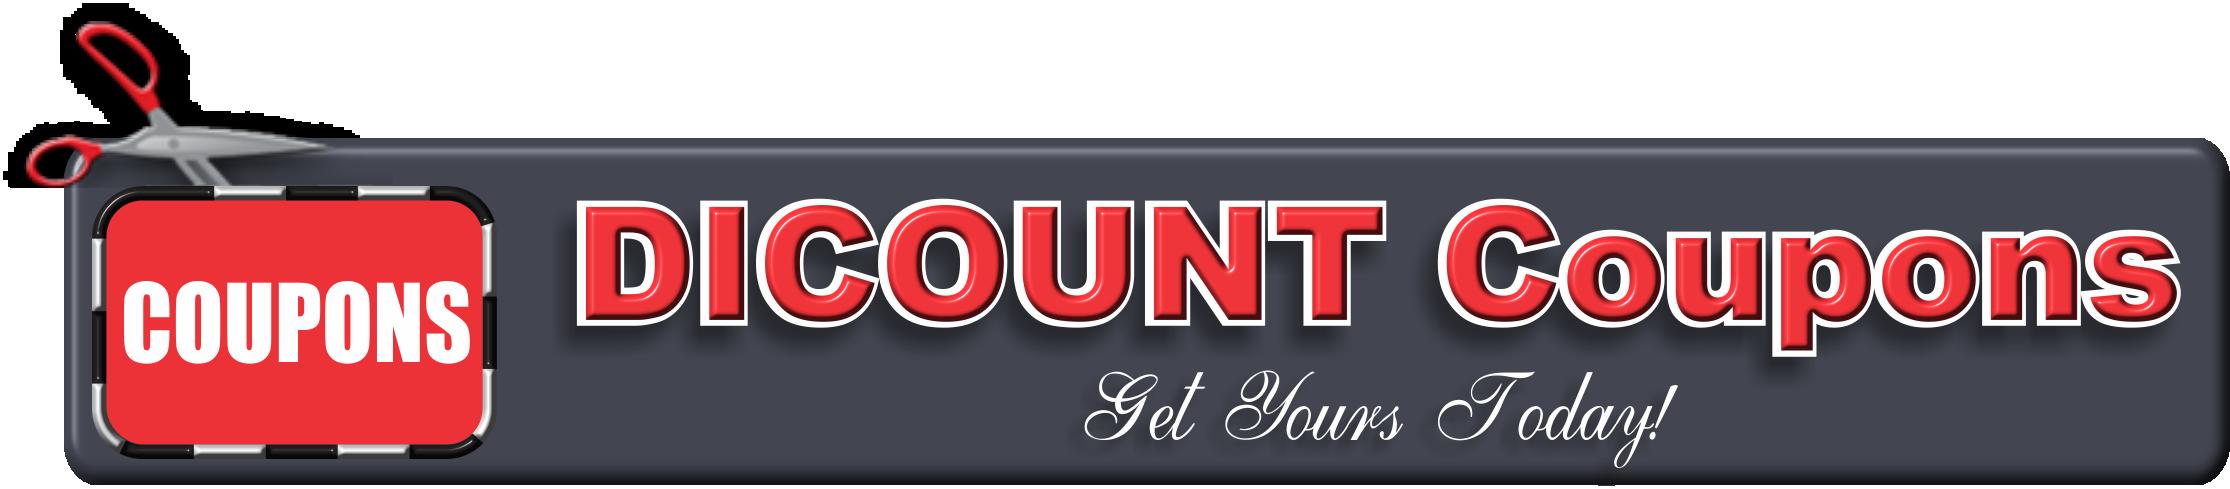 Discount Coupons - J & C Collision Center, Ventura - Oxnard - CA